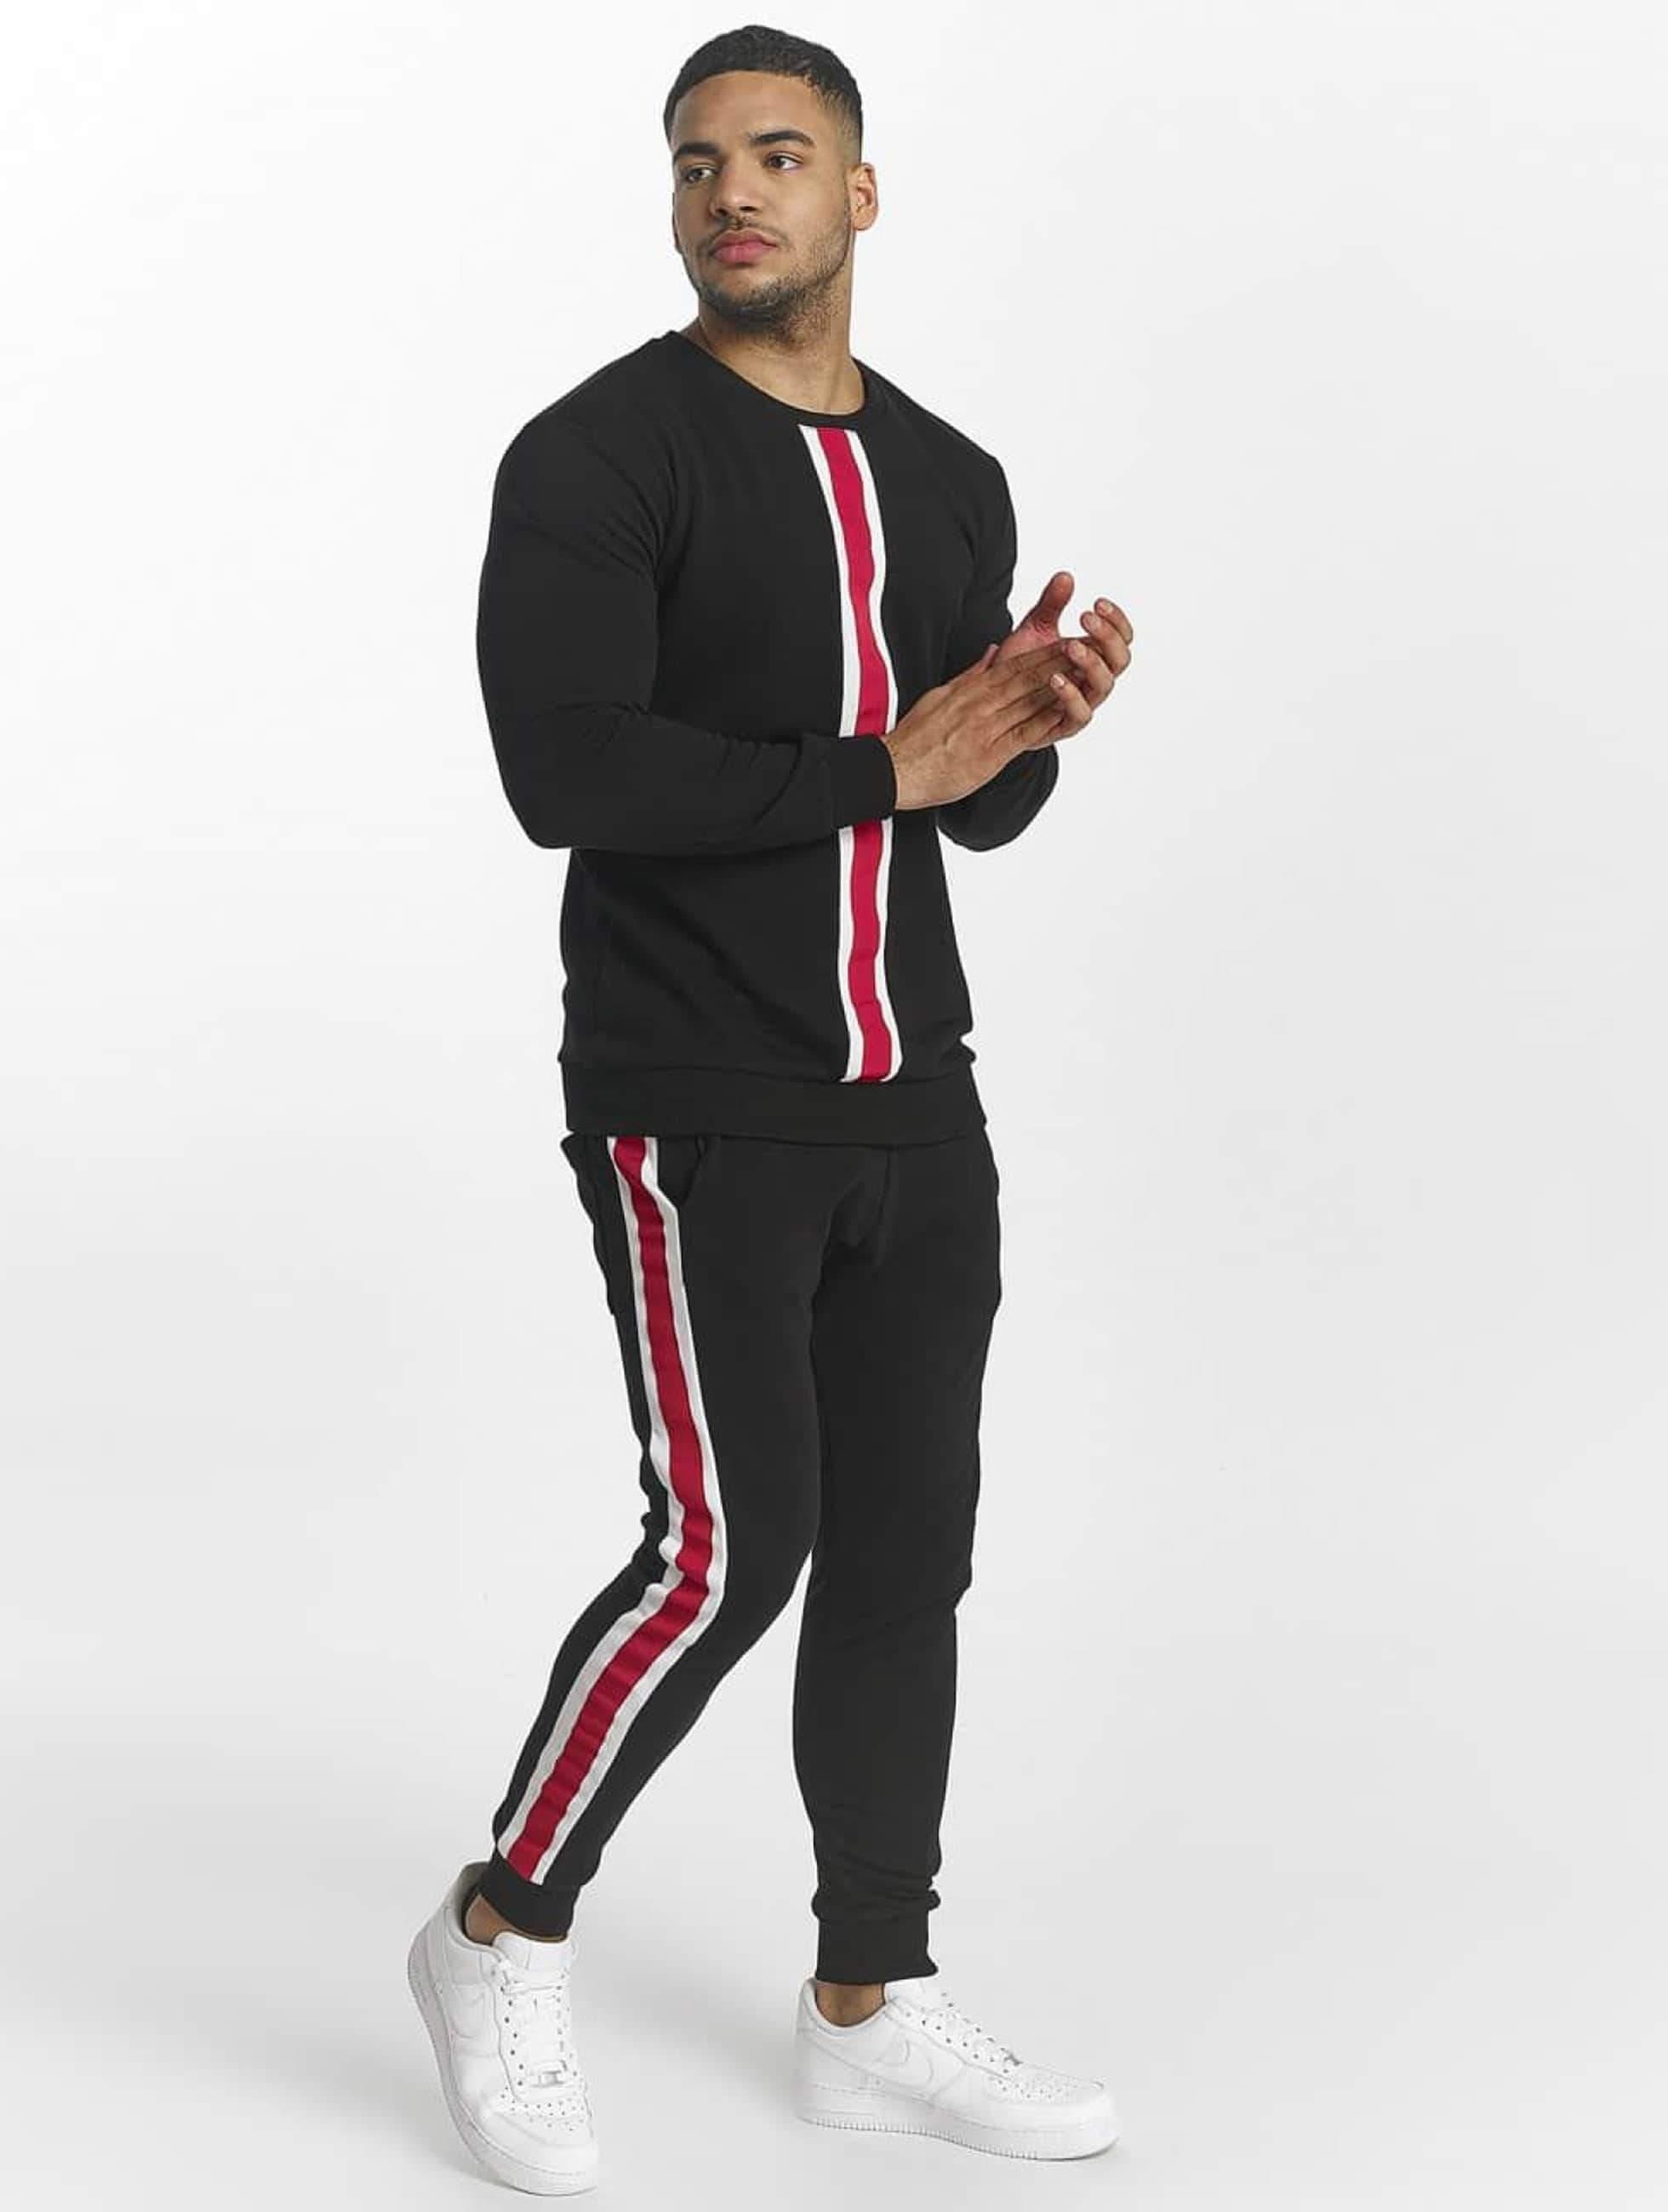 DEF / Suits Lampro in black XL